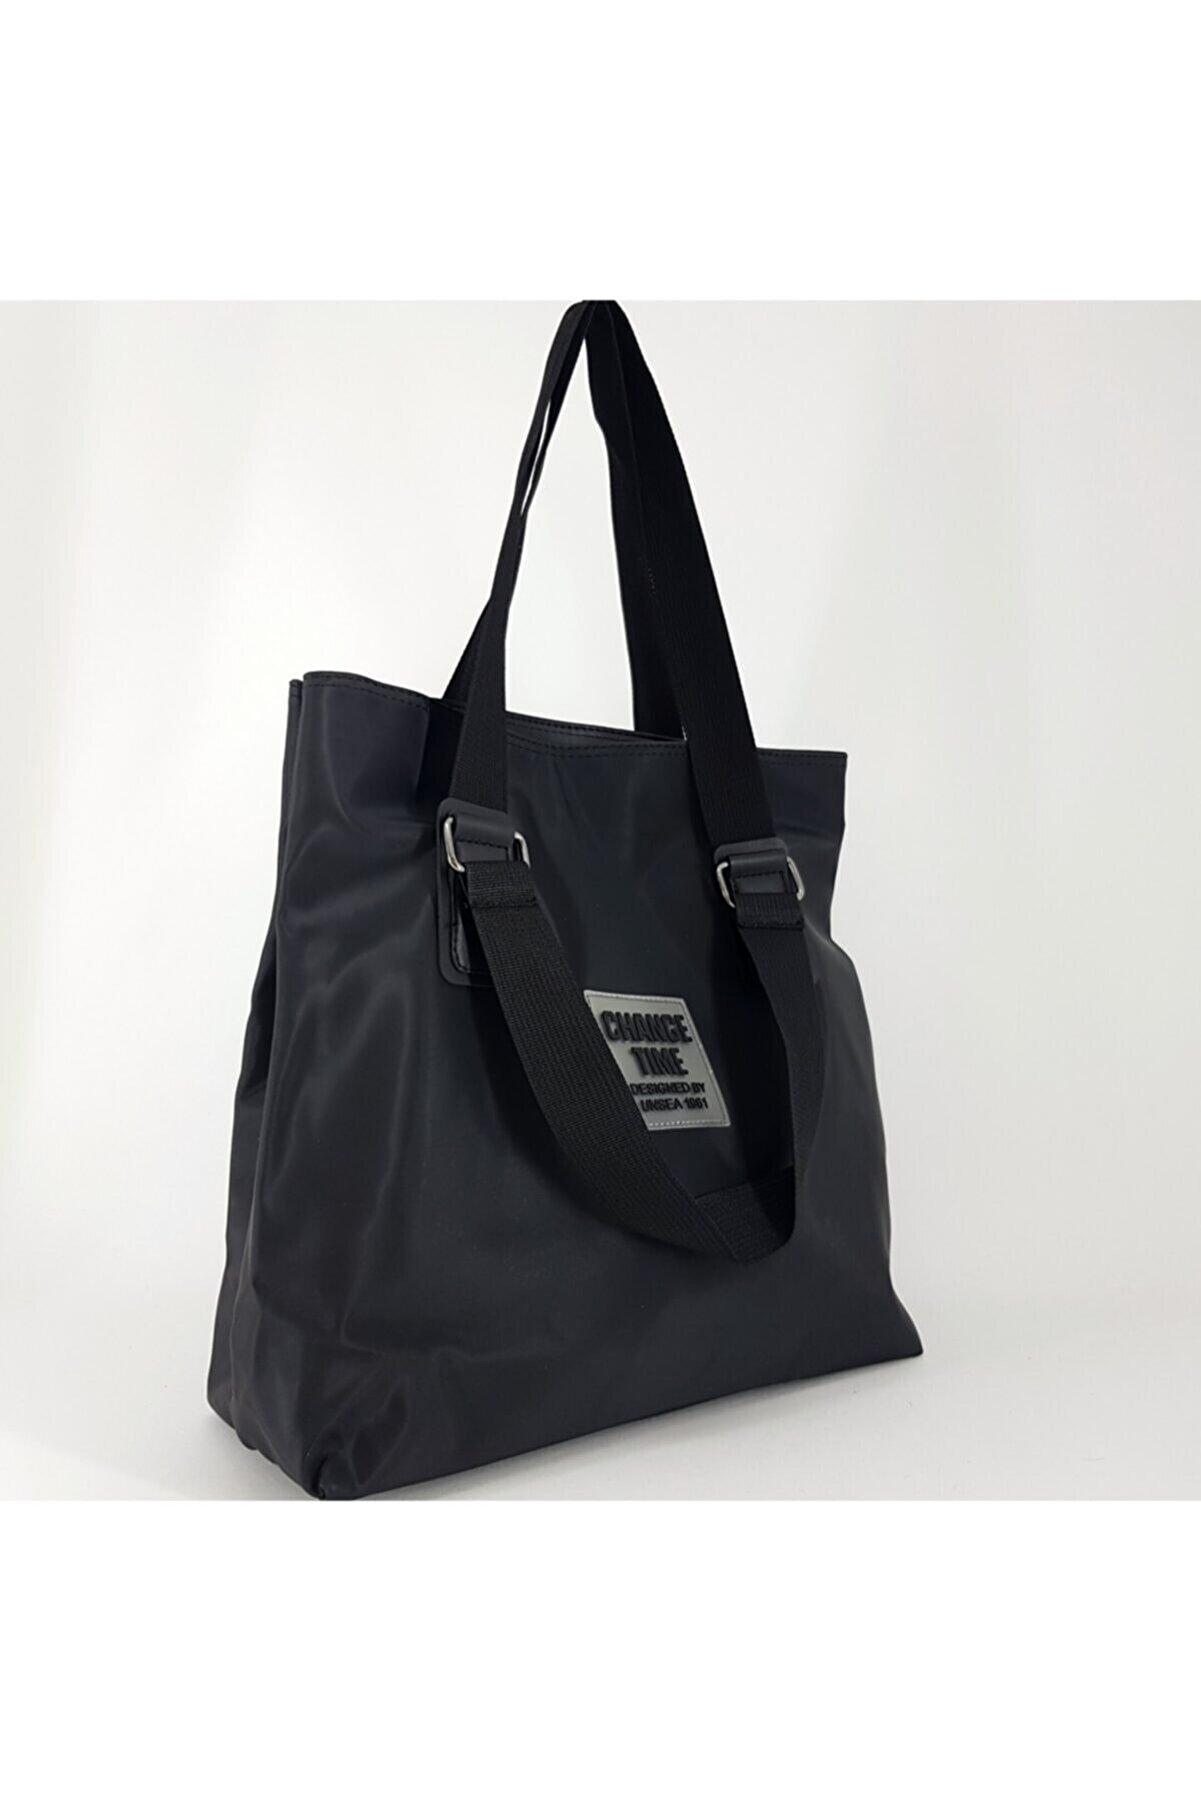 Eylül Bag Missme Siyah Change Time Pat Detayli Shopper Canta